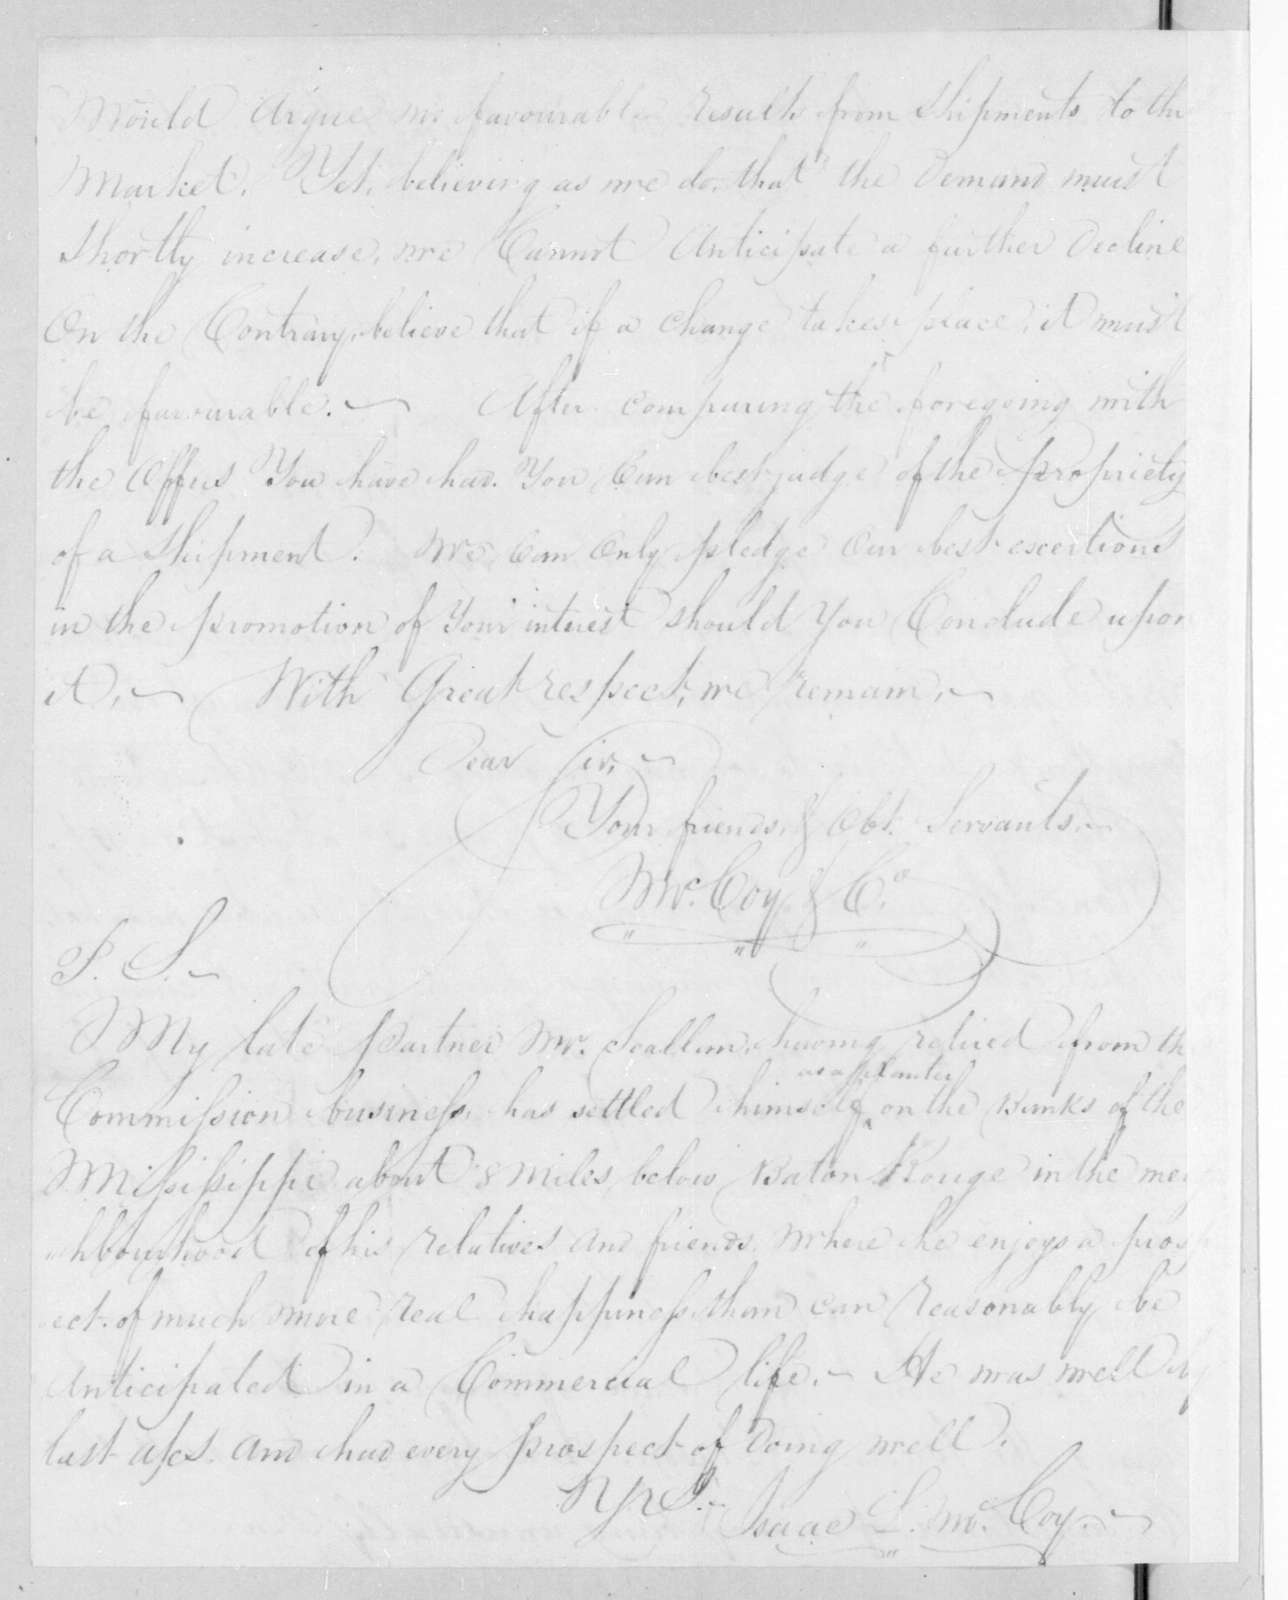 McCoy & Co. to Andrew Jackson, December 13, 1822